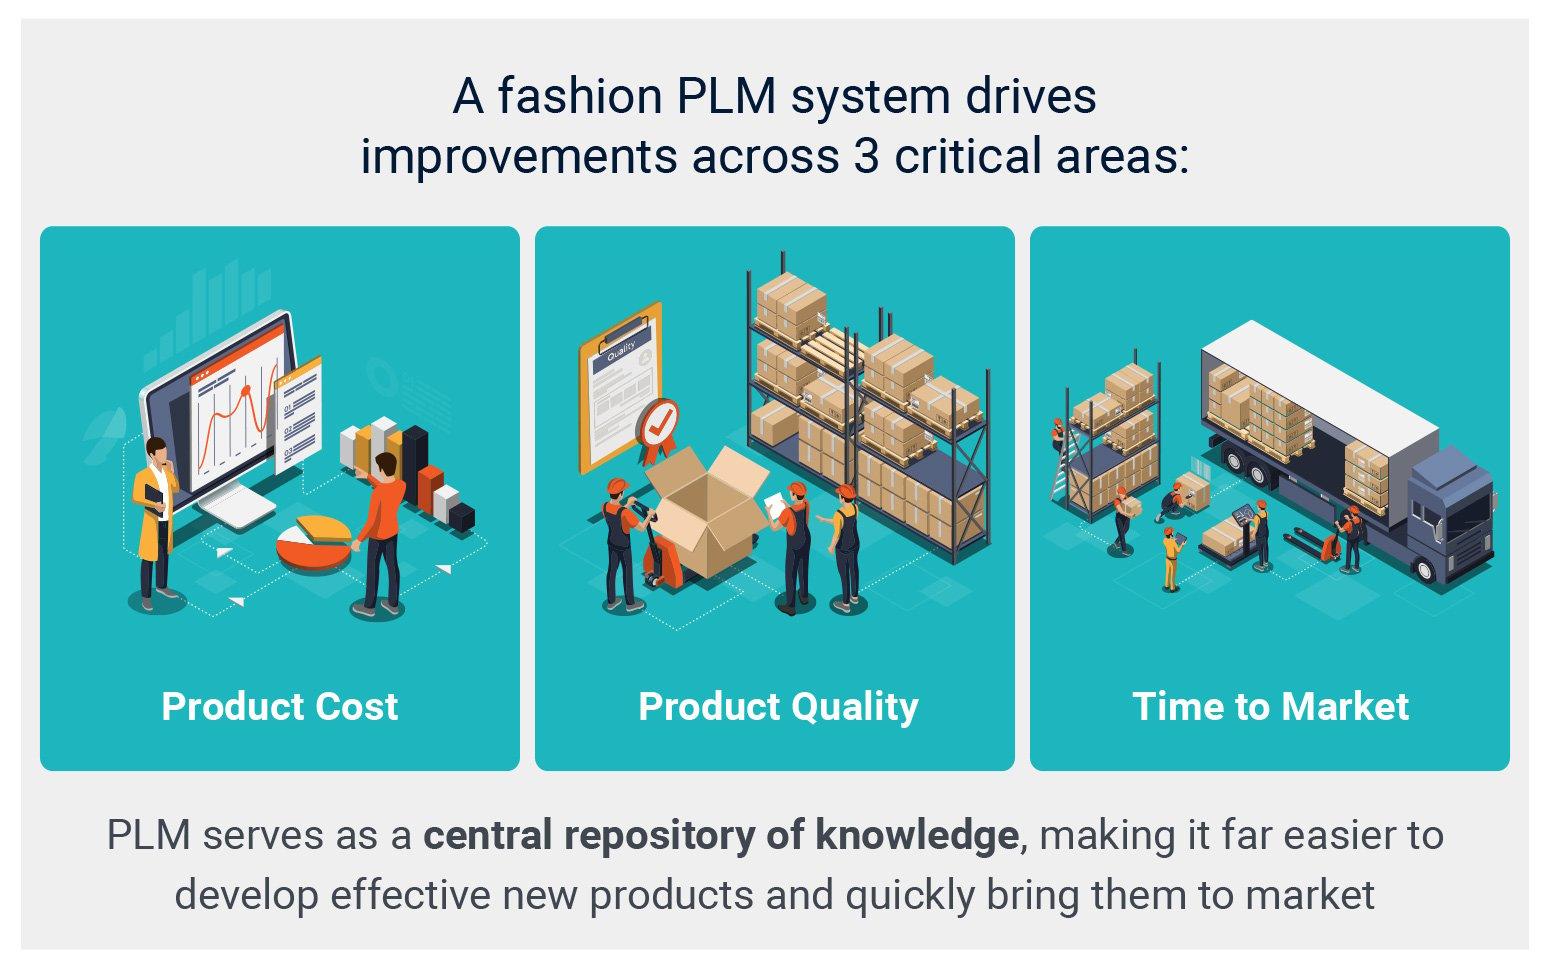 PLM for Fashion Improvements